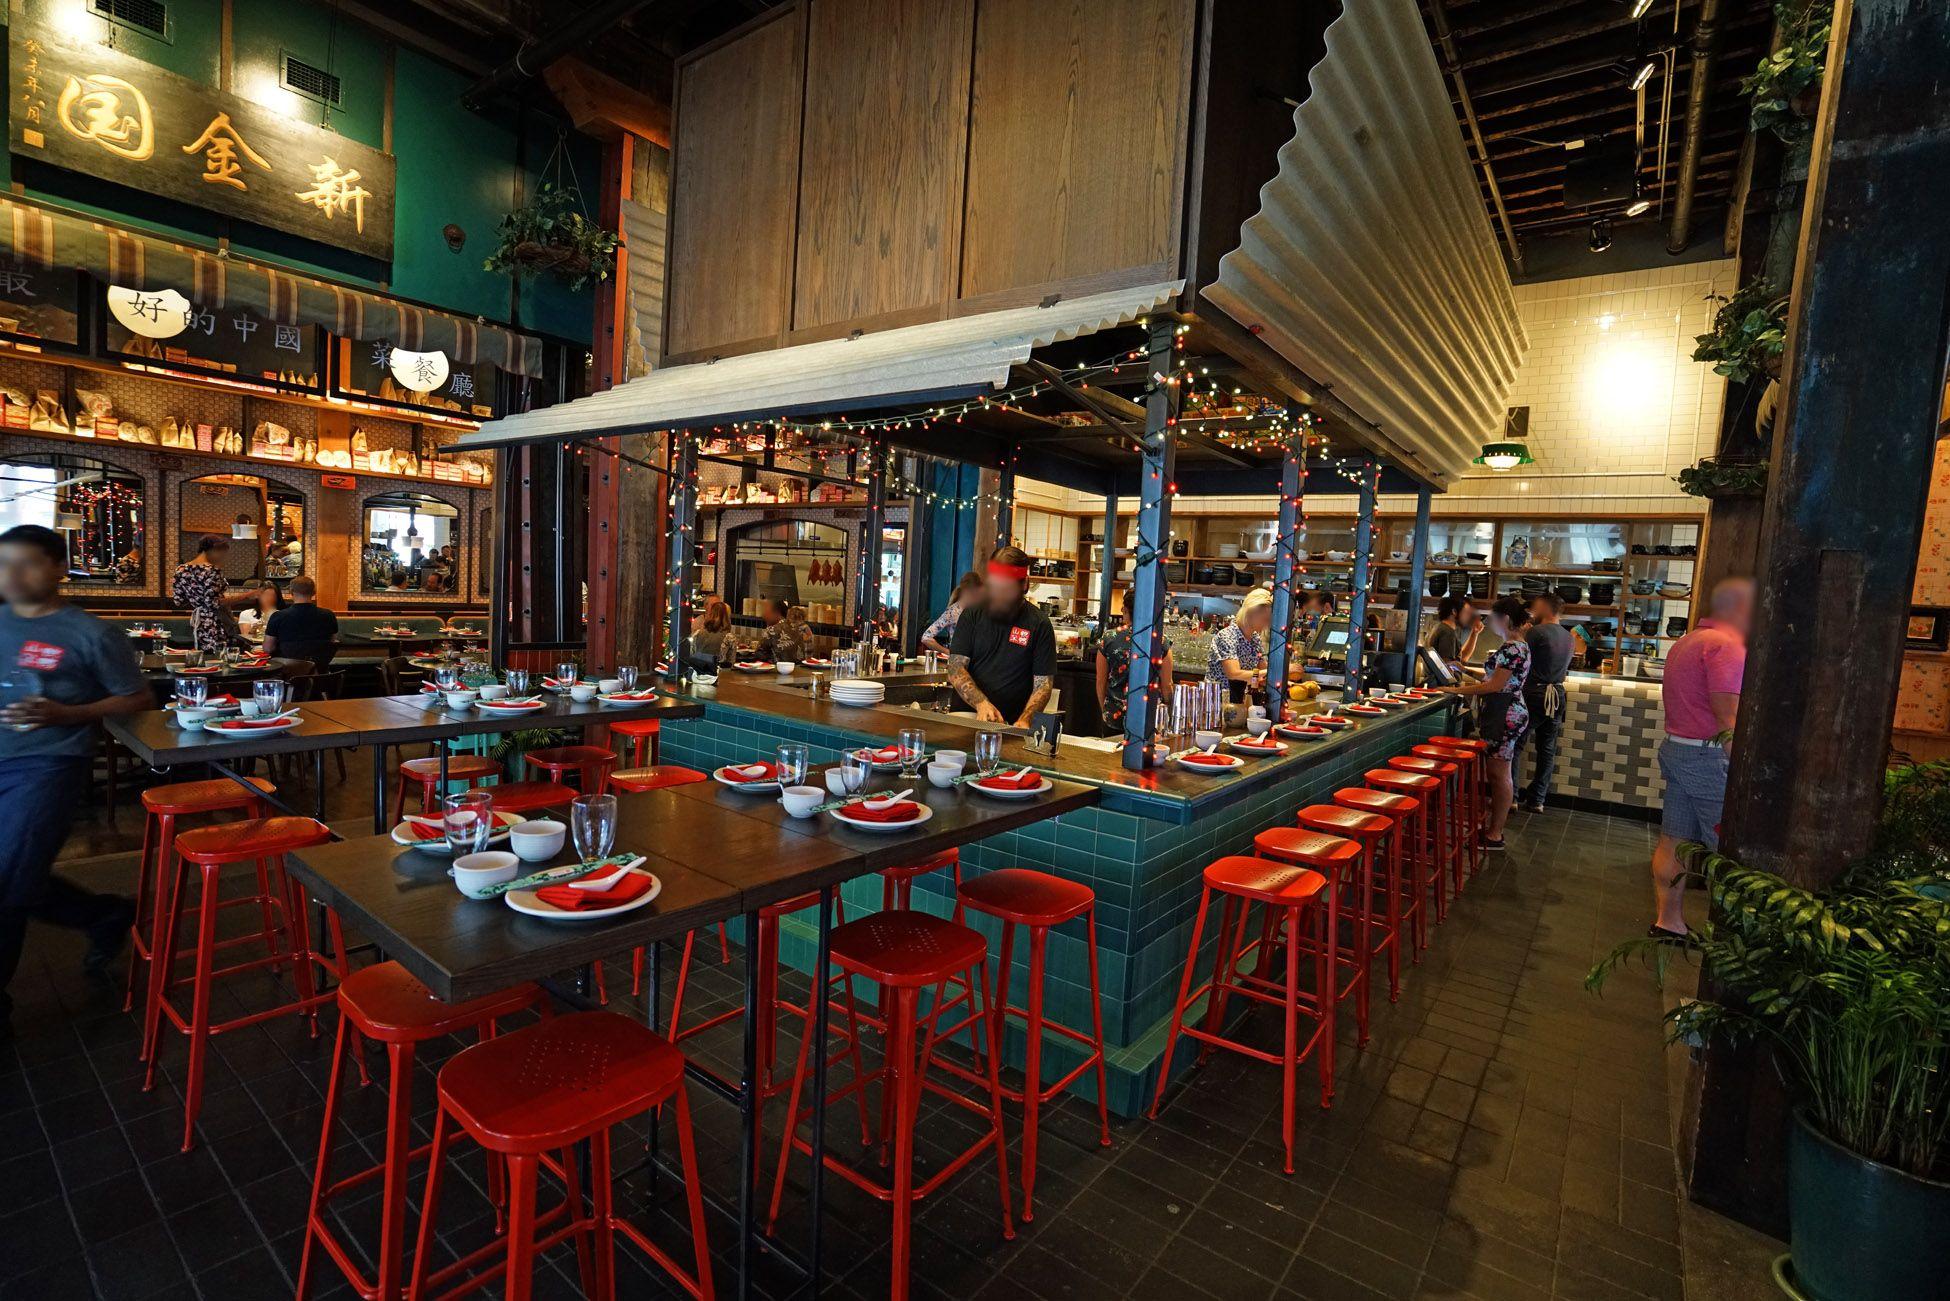 Thai Food Restaurant Street Food Design Asian Cafe